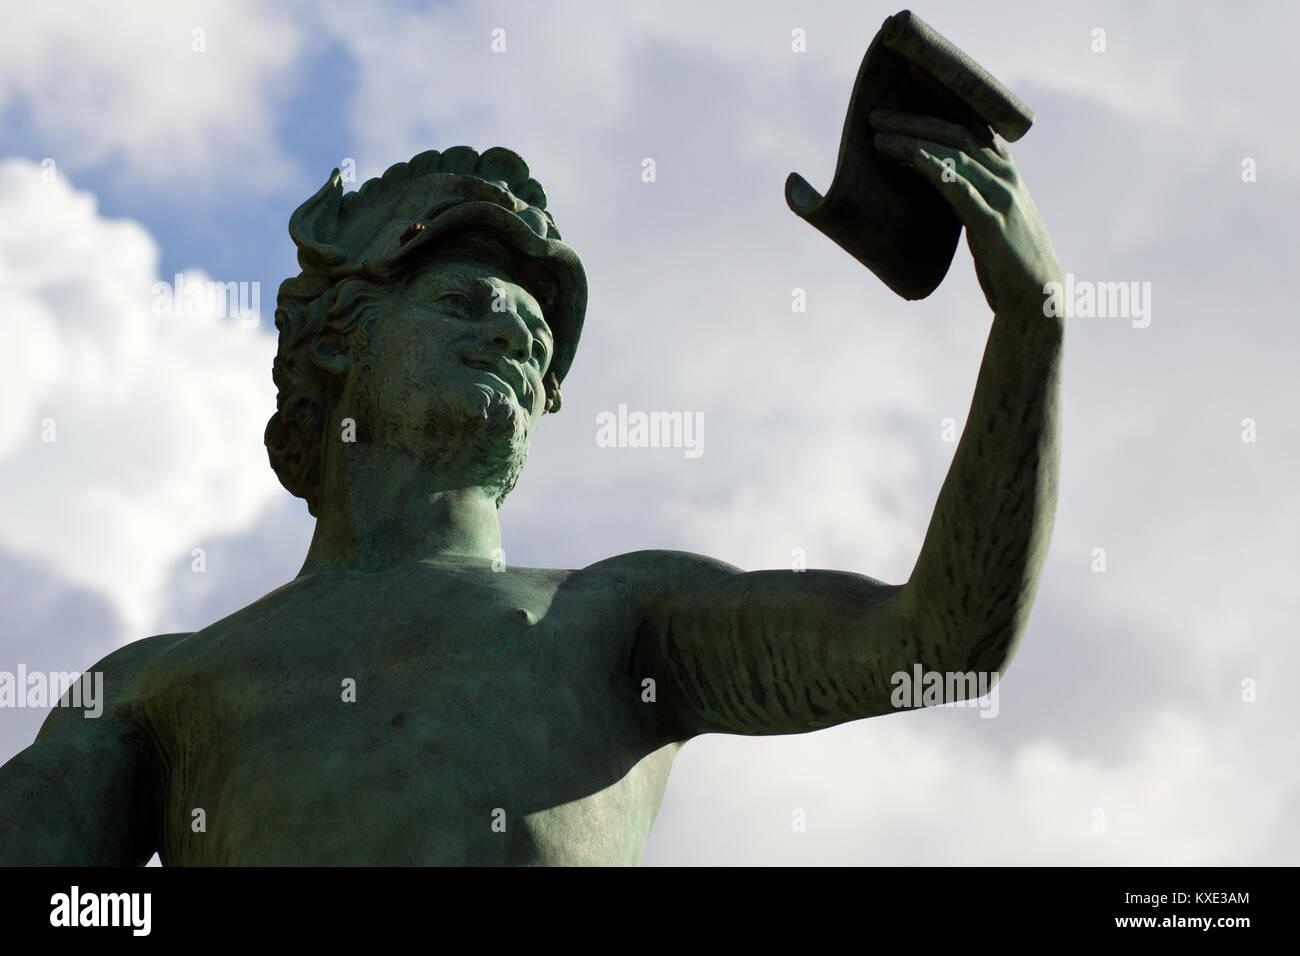 The Greek Actor - Jardin Du Luxembourg - Paris - Stock Image